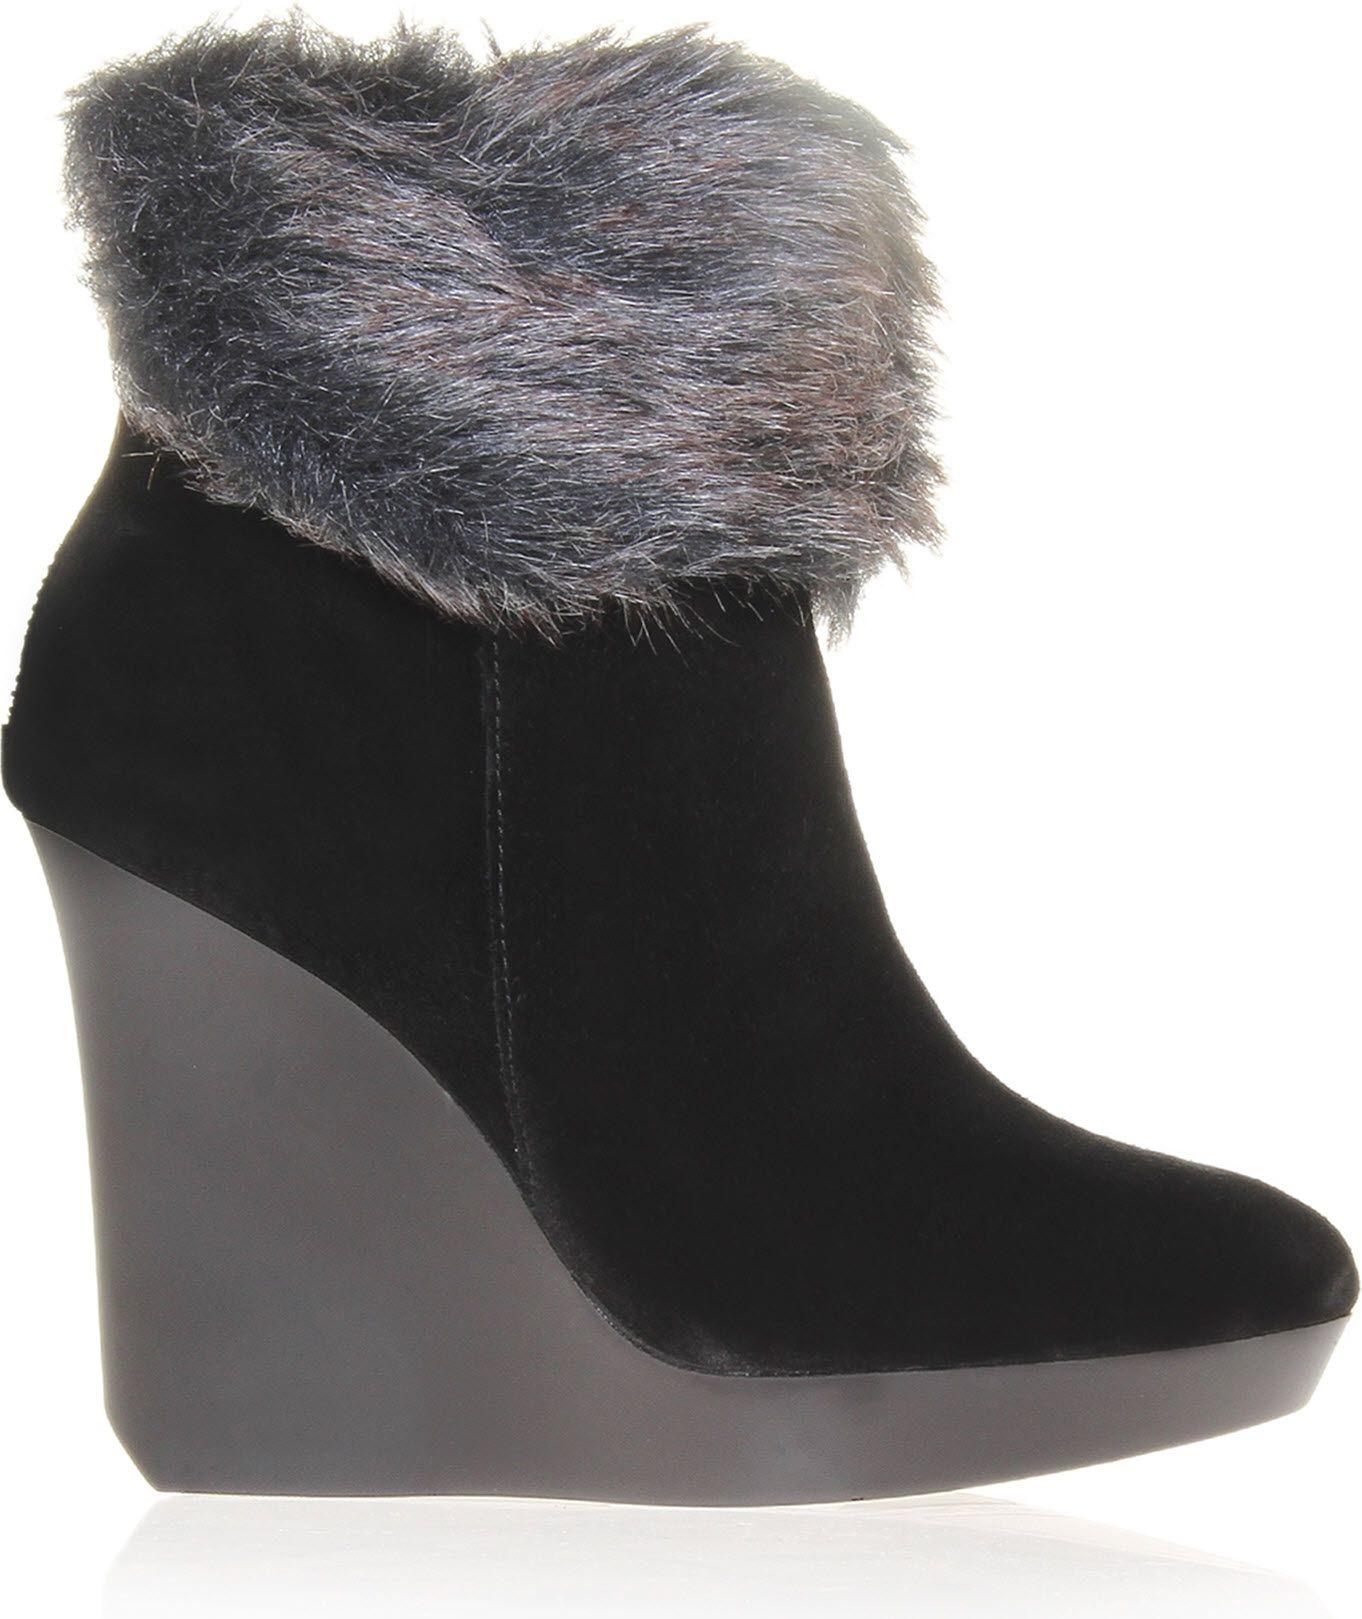 nine west yeena suede wedge boots in black lyst